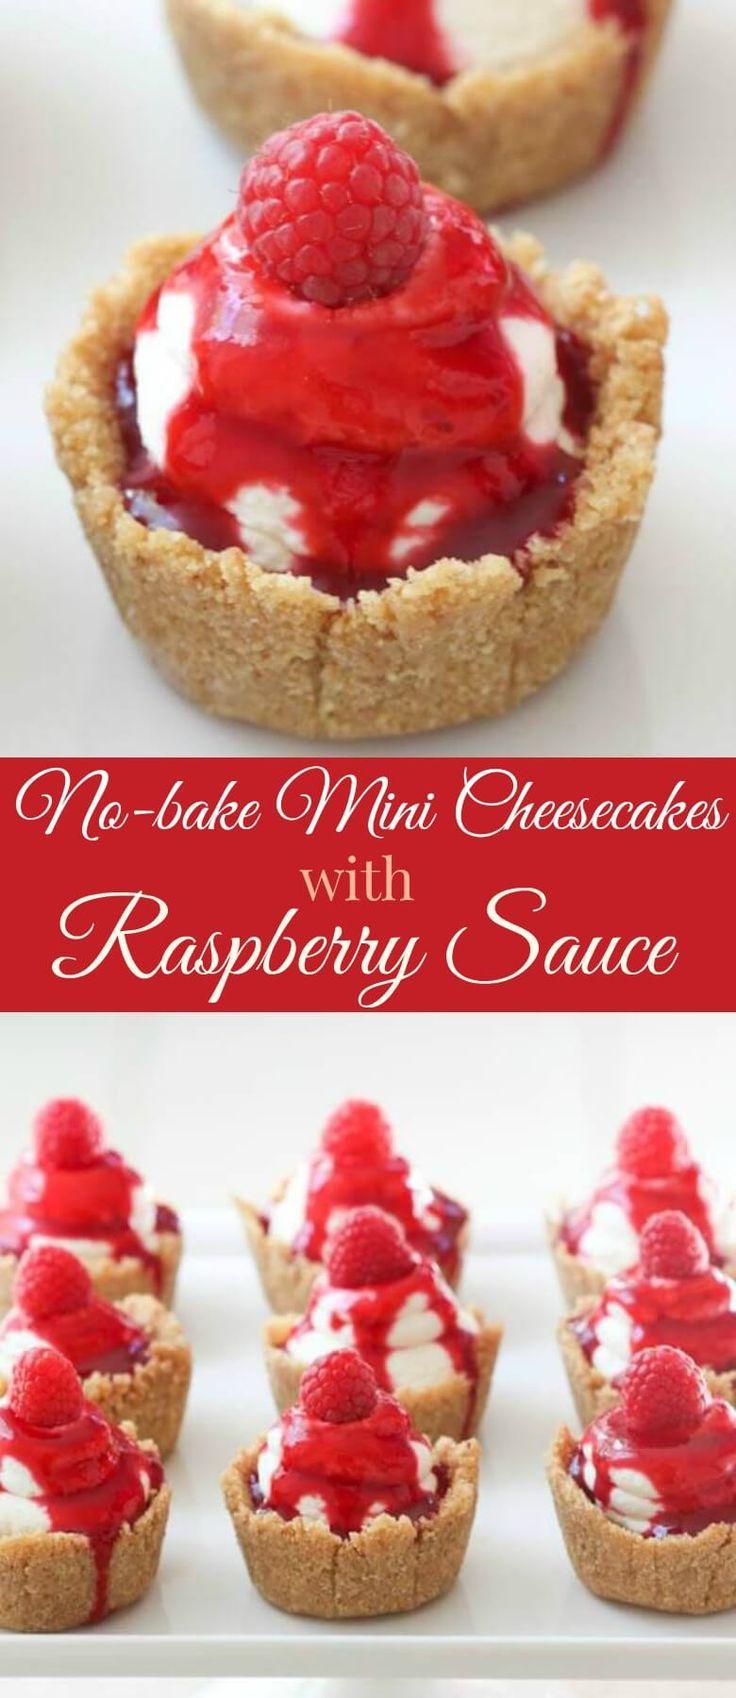 No-Bake Mini Cheesecakes with Raspberry Sauce via @ohsweetbasil